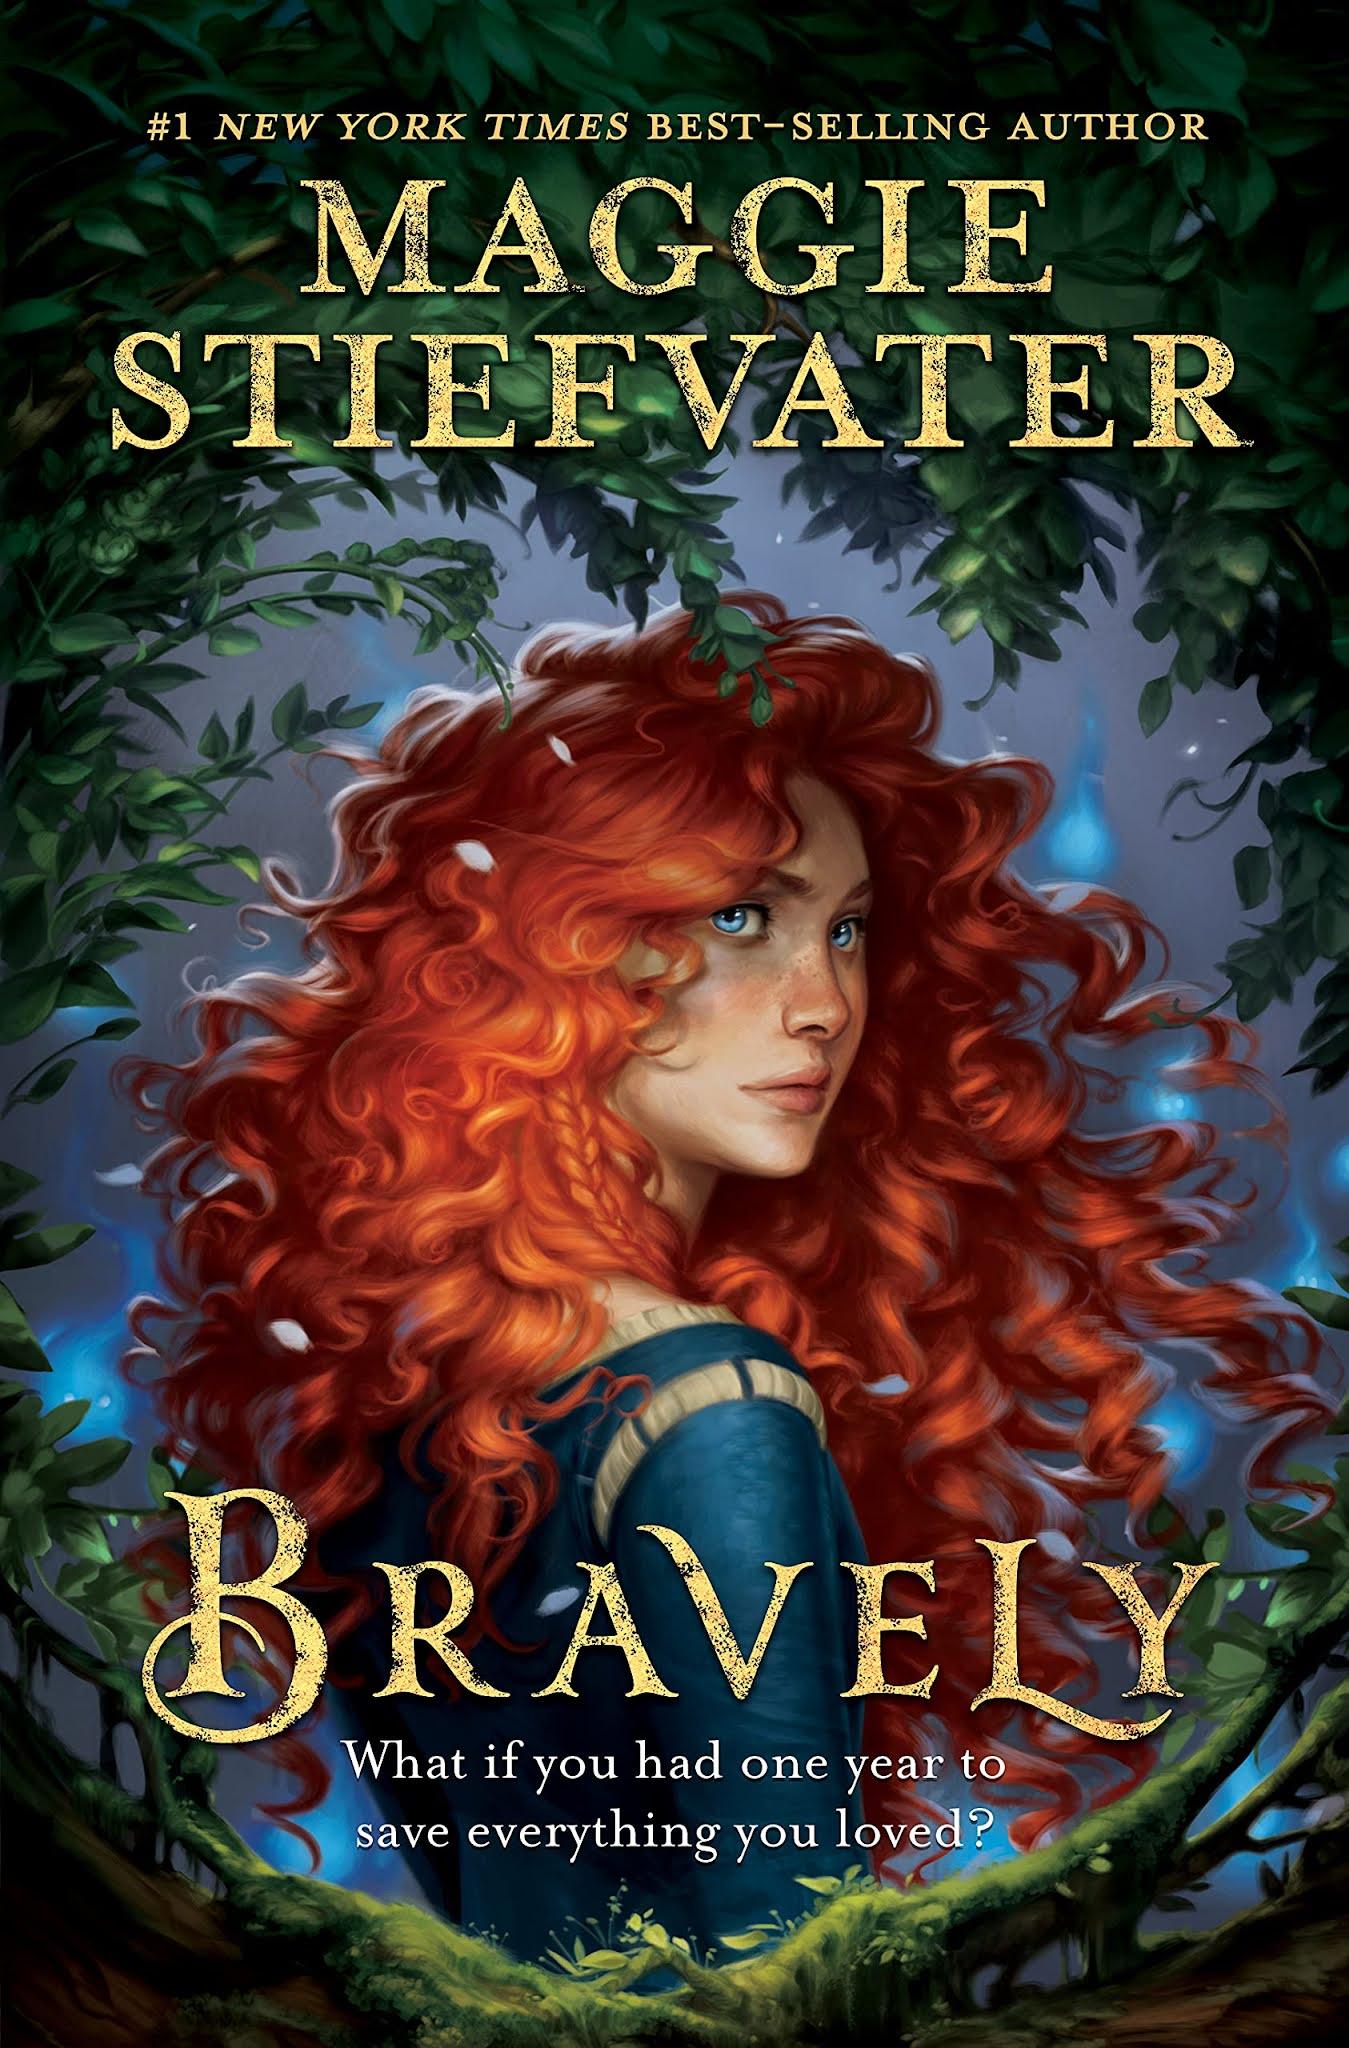 Bravely by Maggie Stiefvater